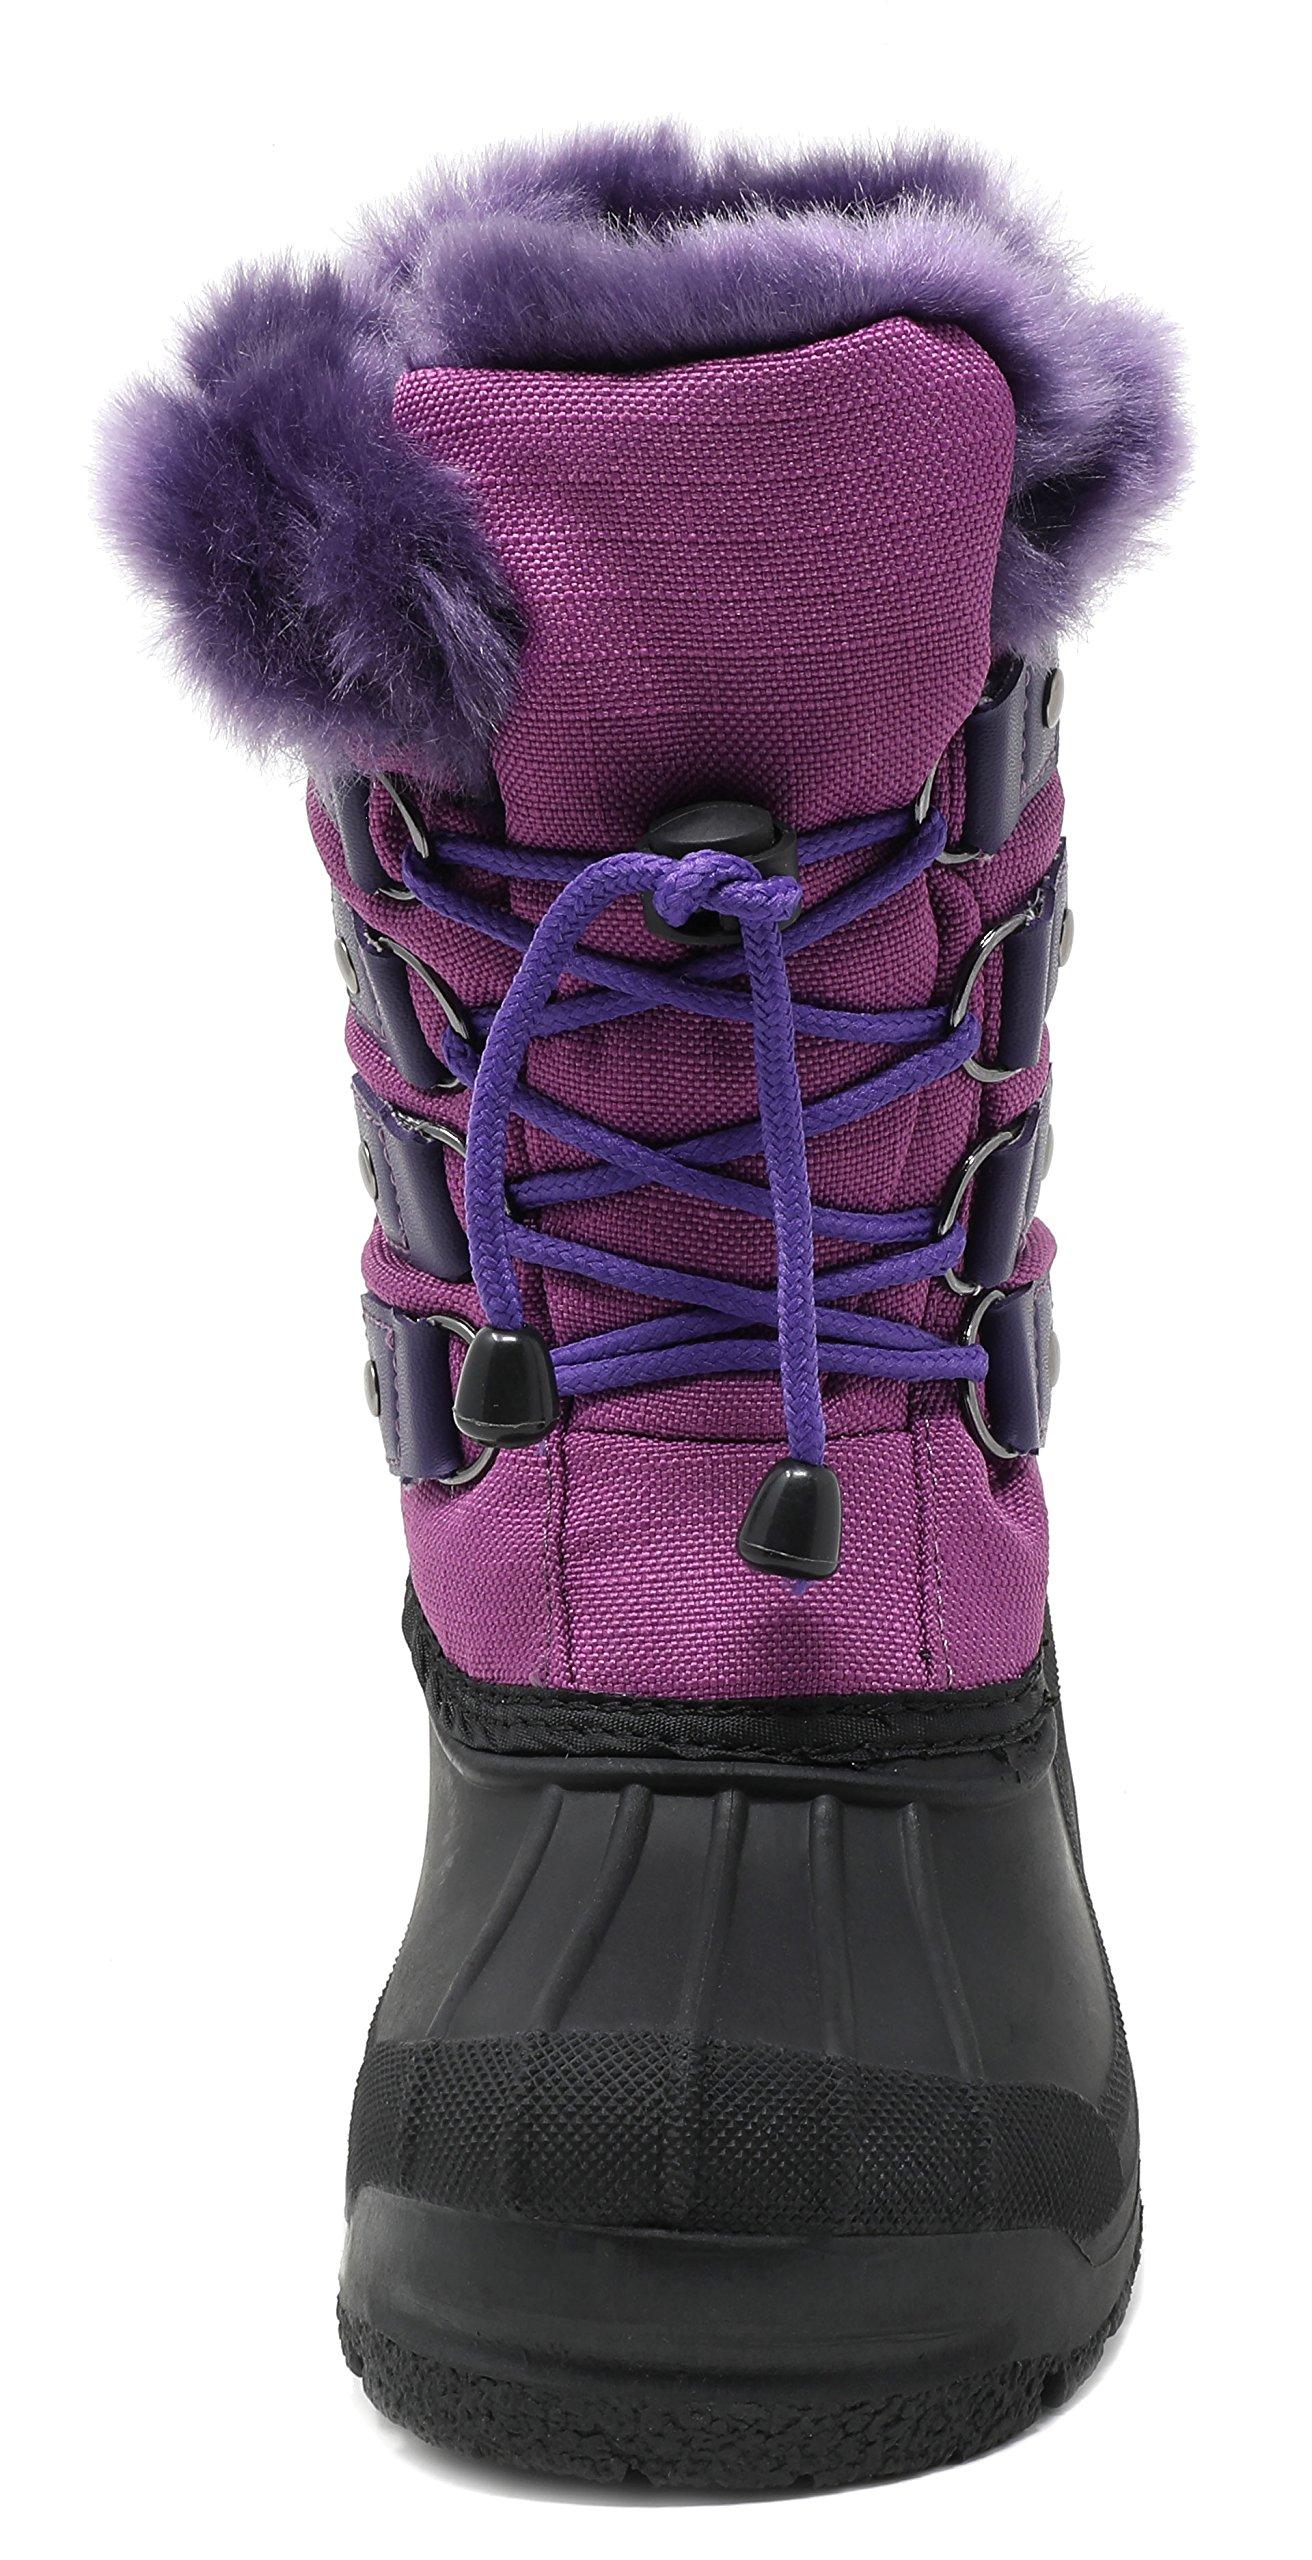 Kids Boys Girls Toddler Insulated Fur Waterproof Winter Snow Boots